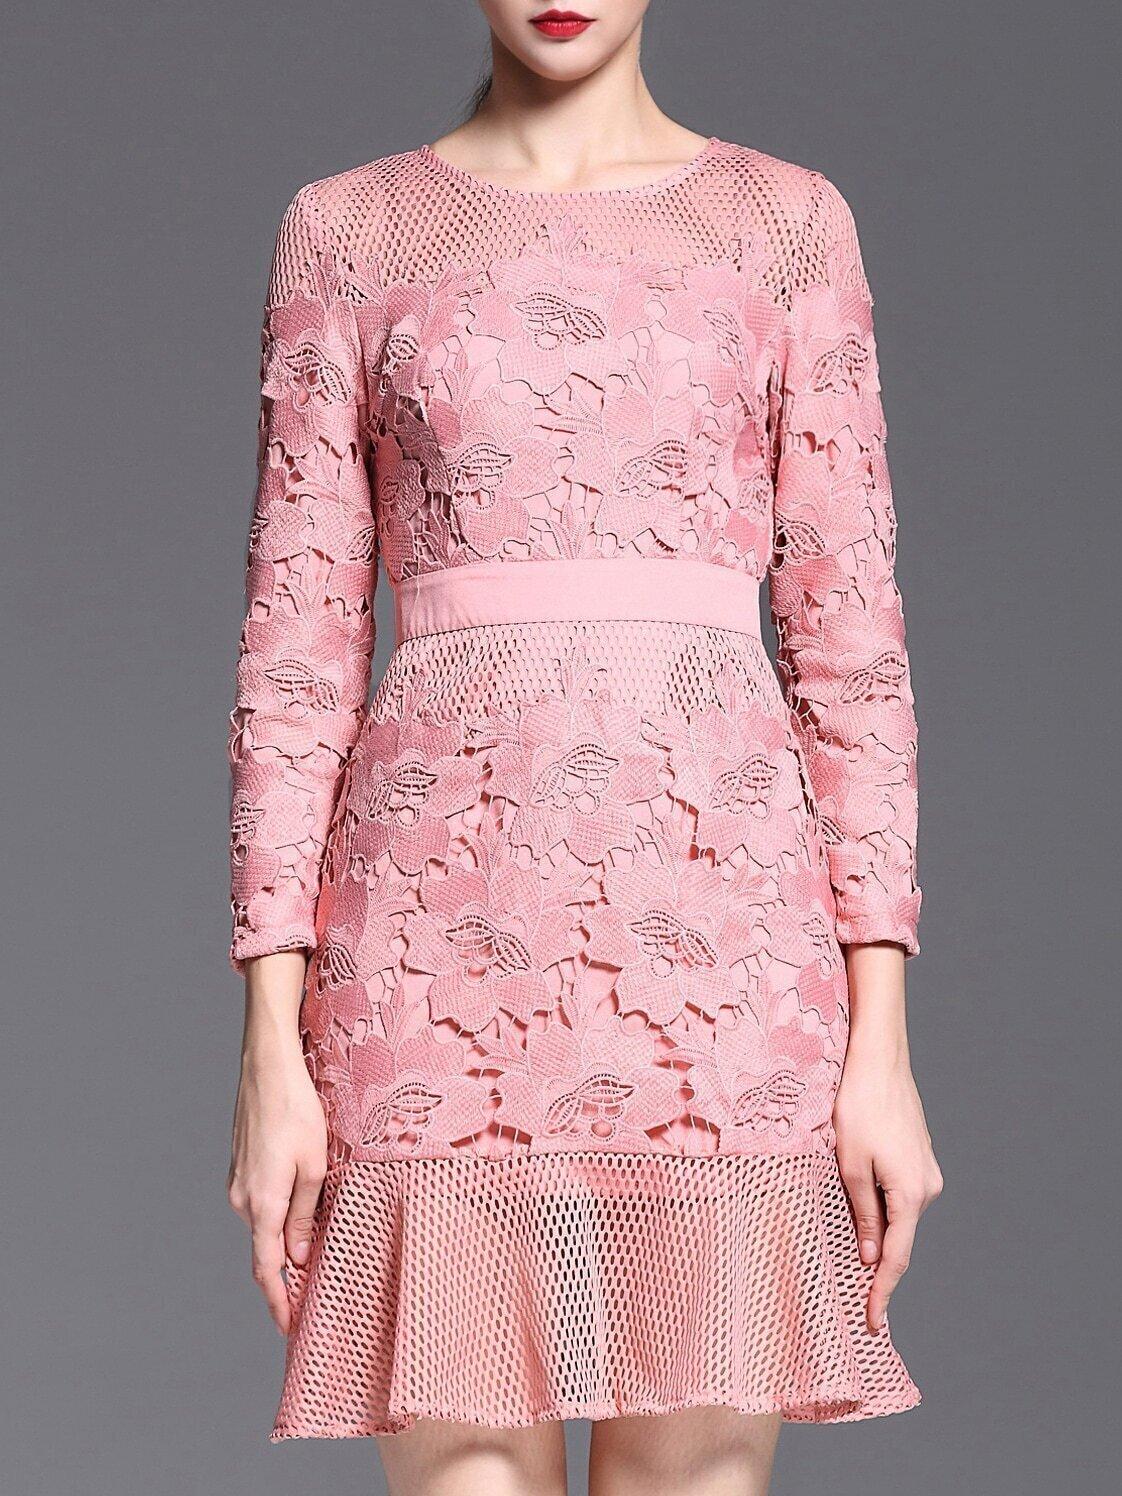 Pink Round Neck Long Sleeve Crochet Dress